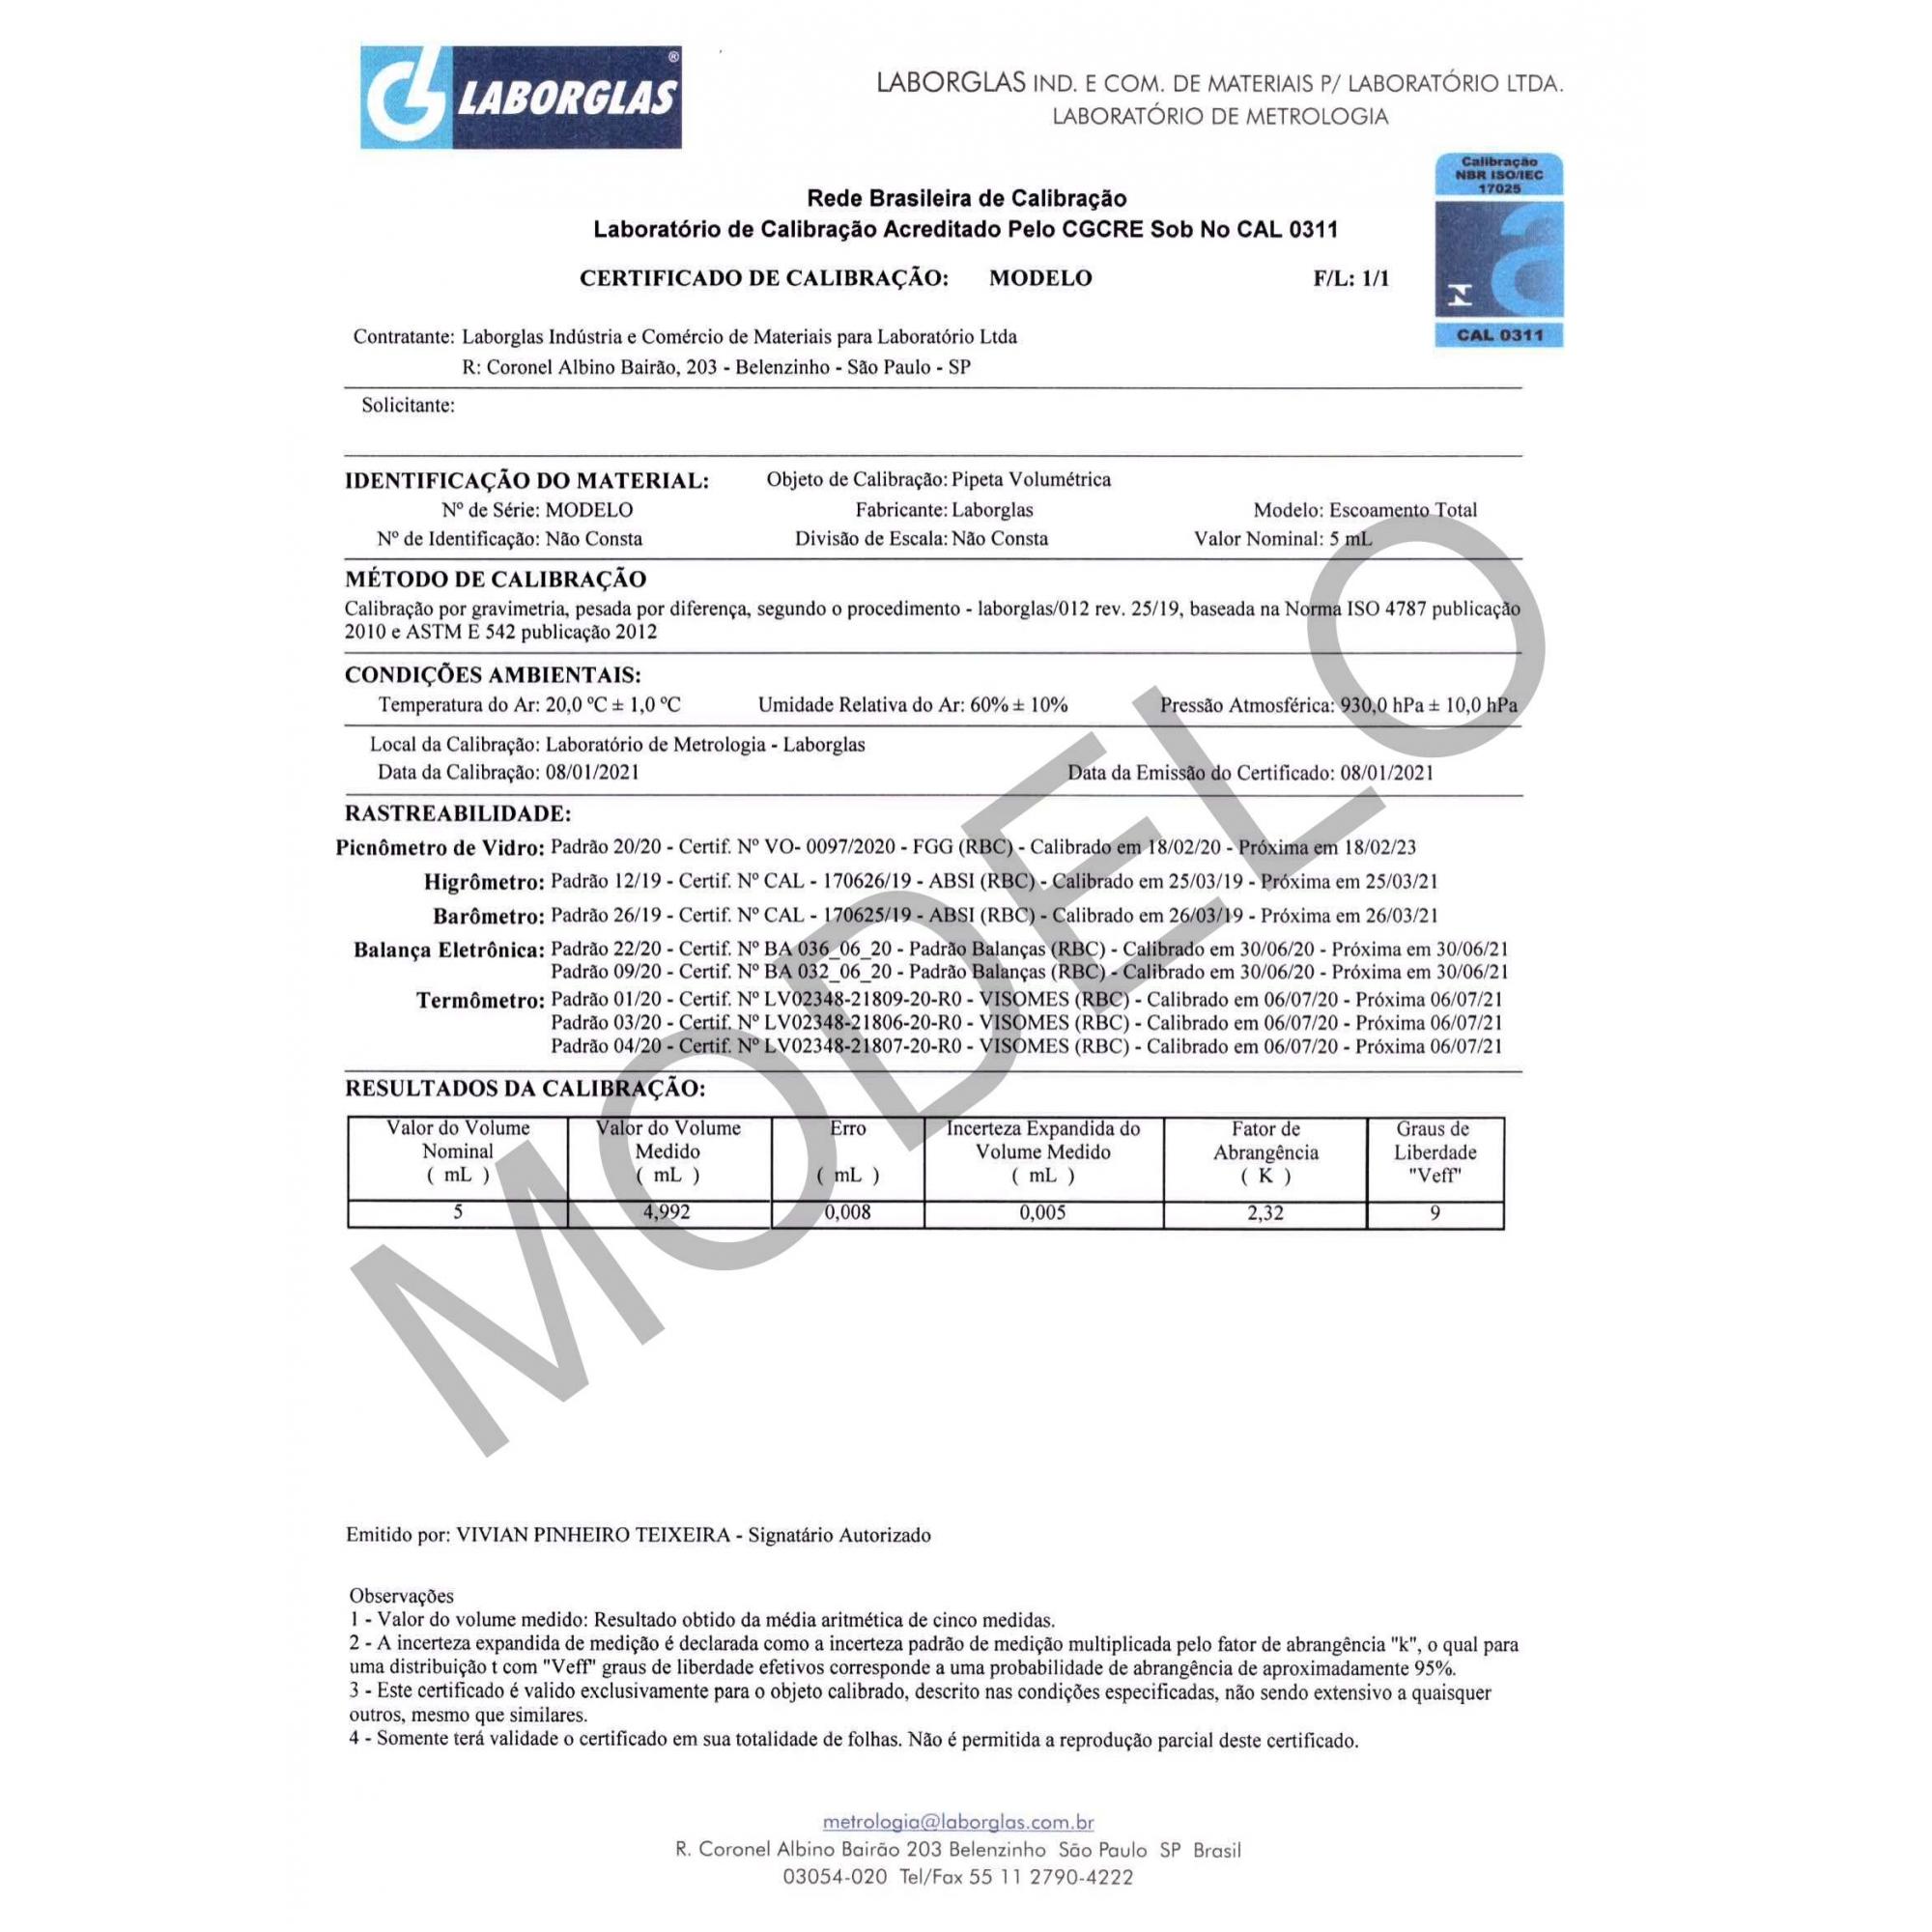 PIPETA VOLUMÉTRICA ESGOTAMENTO TOTAL 3,5 ML CERTIFICADO RBC - Laborglas - Cód. 9433721-R